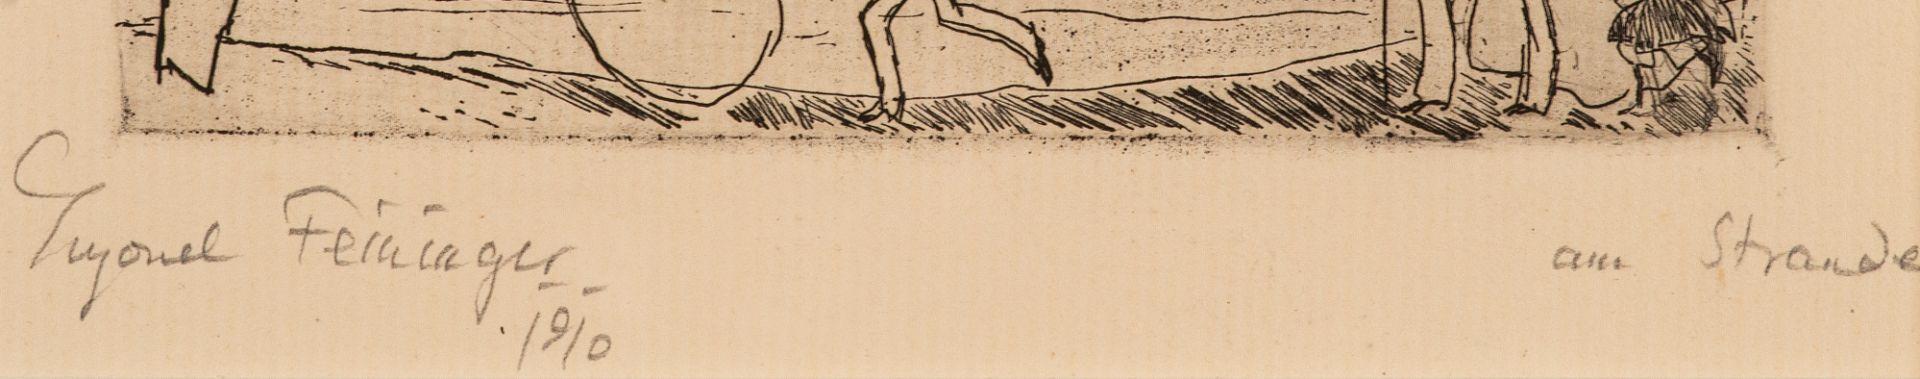 Lyonel Feininger – Am Strande. - Image 2 of 2